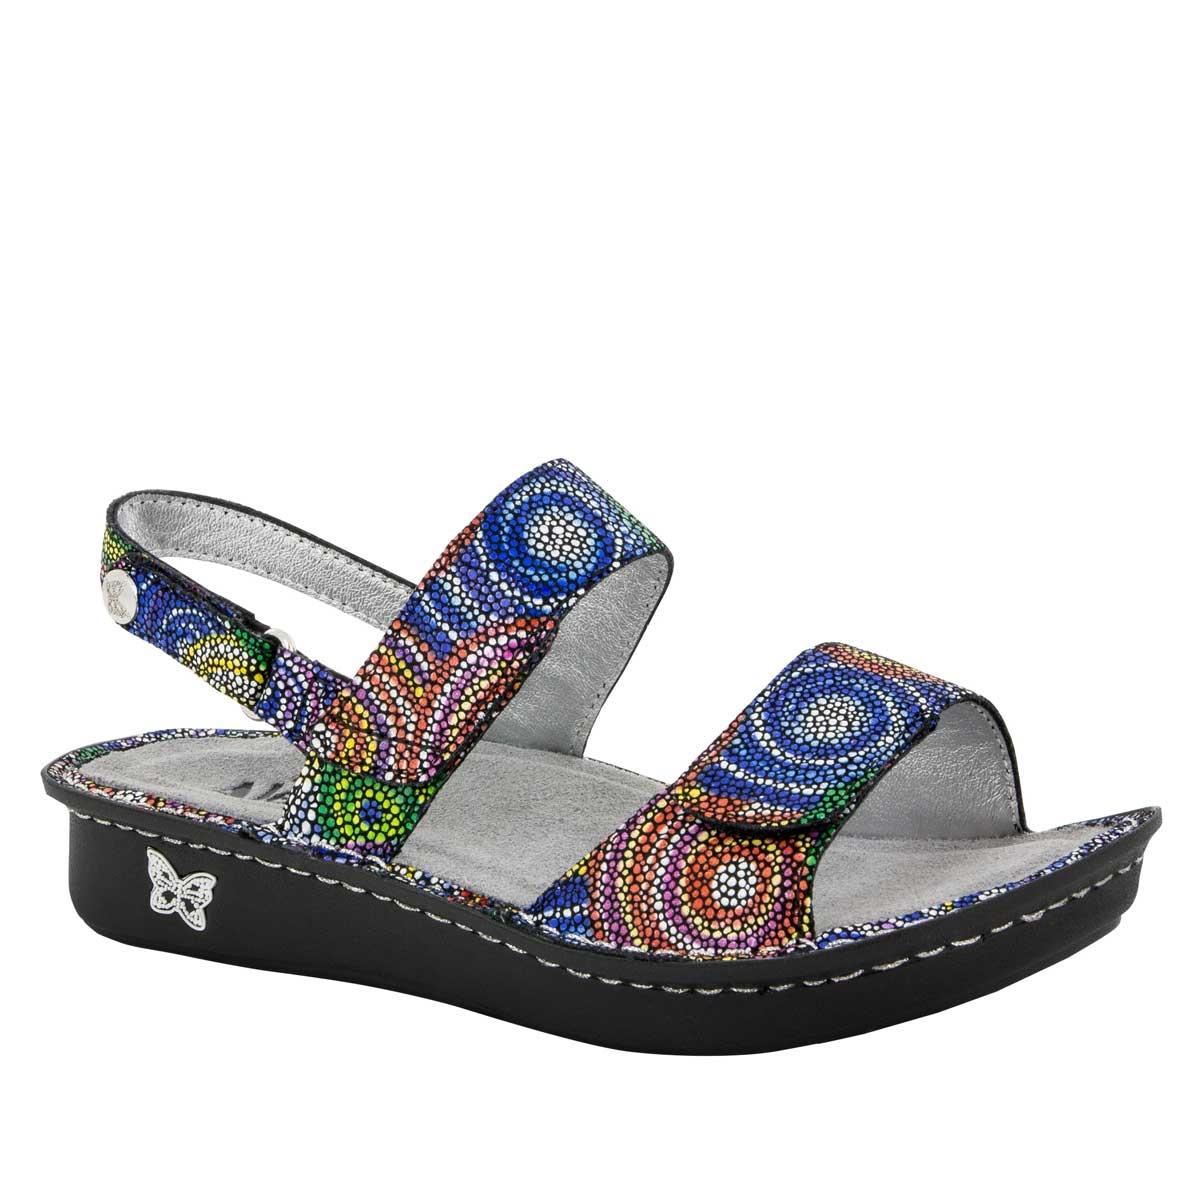 Alegria Verona Bullseye Sandals Shop Alegria Shoes